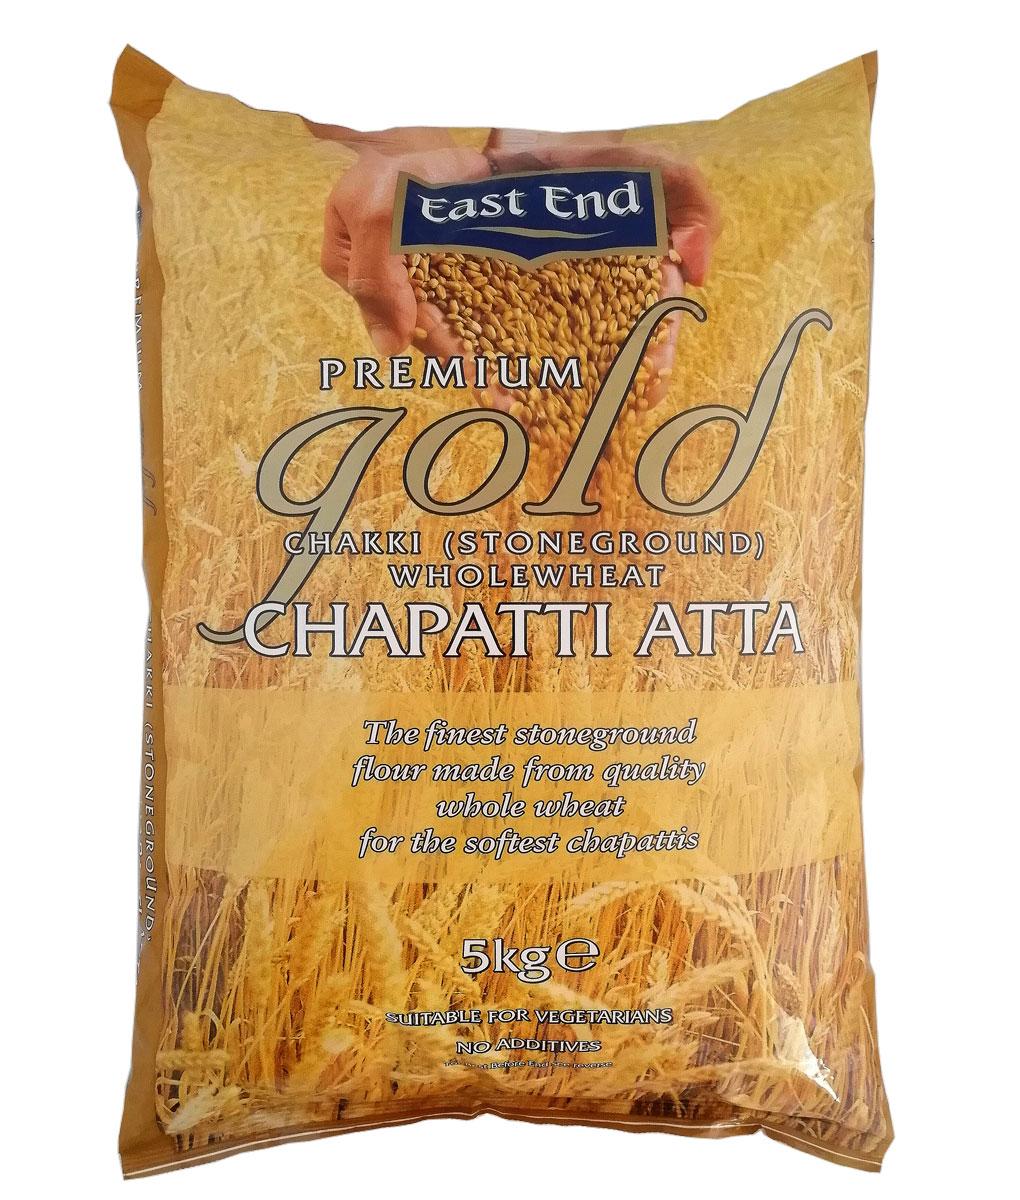 EAST END GOLD CHAPPATI ATTA